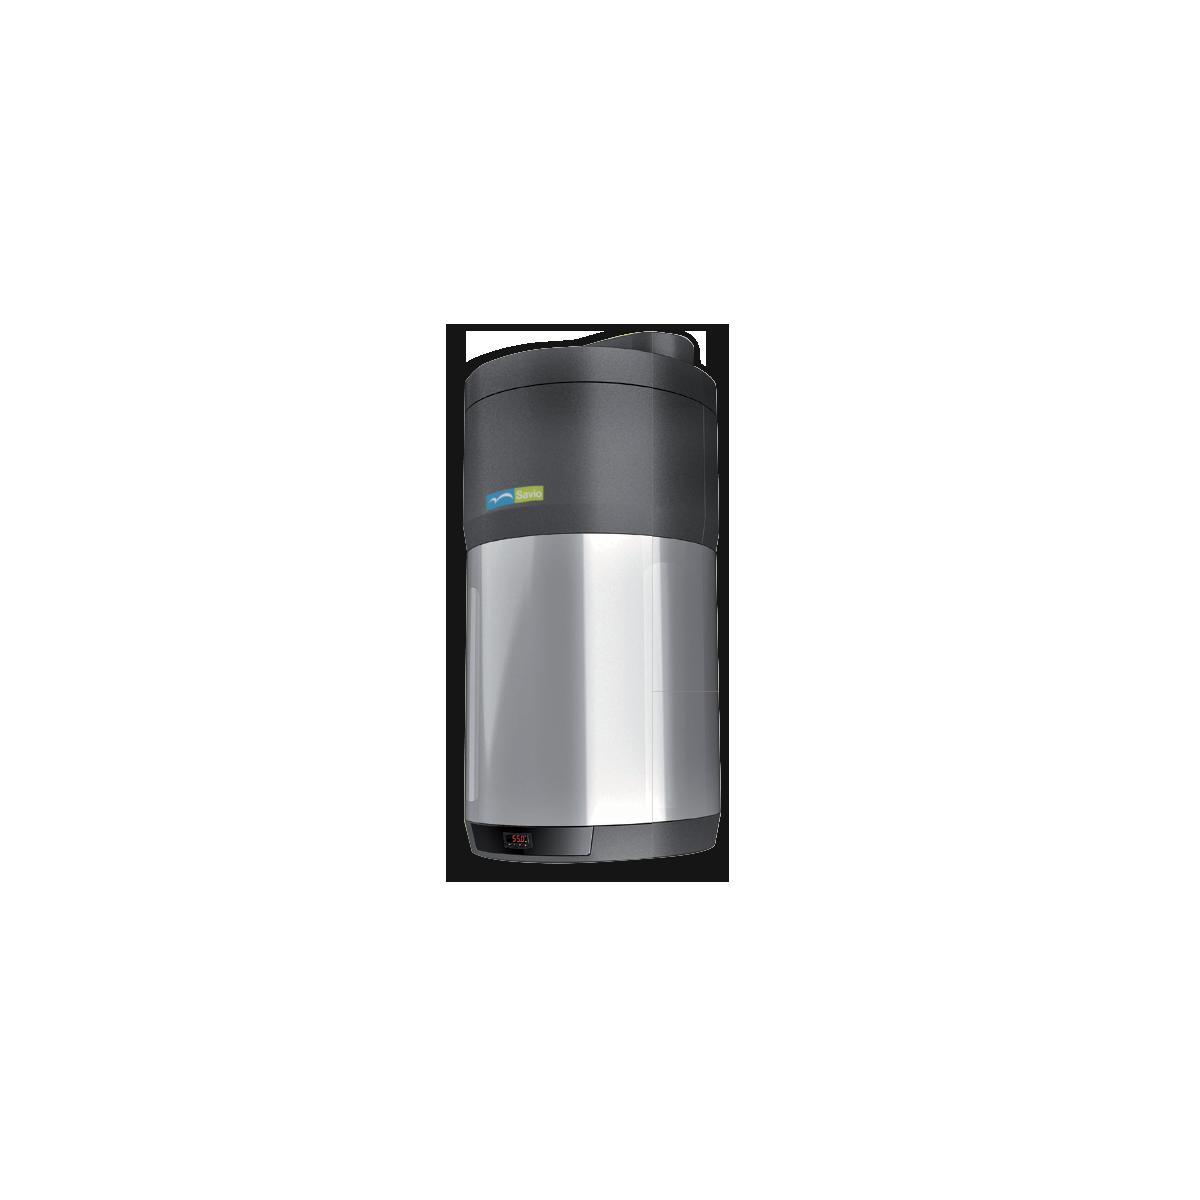 GELPUR LIGHT 1/19 LCD